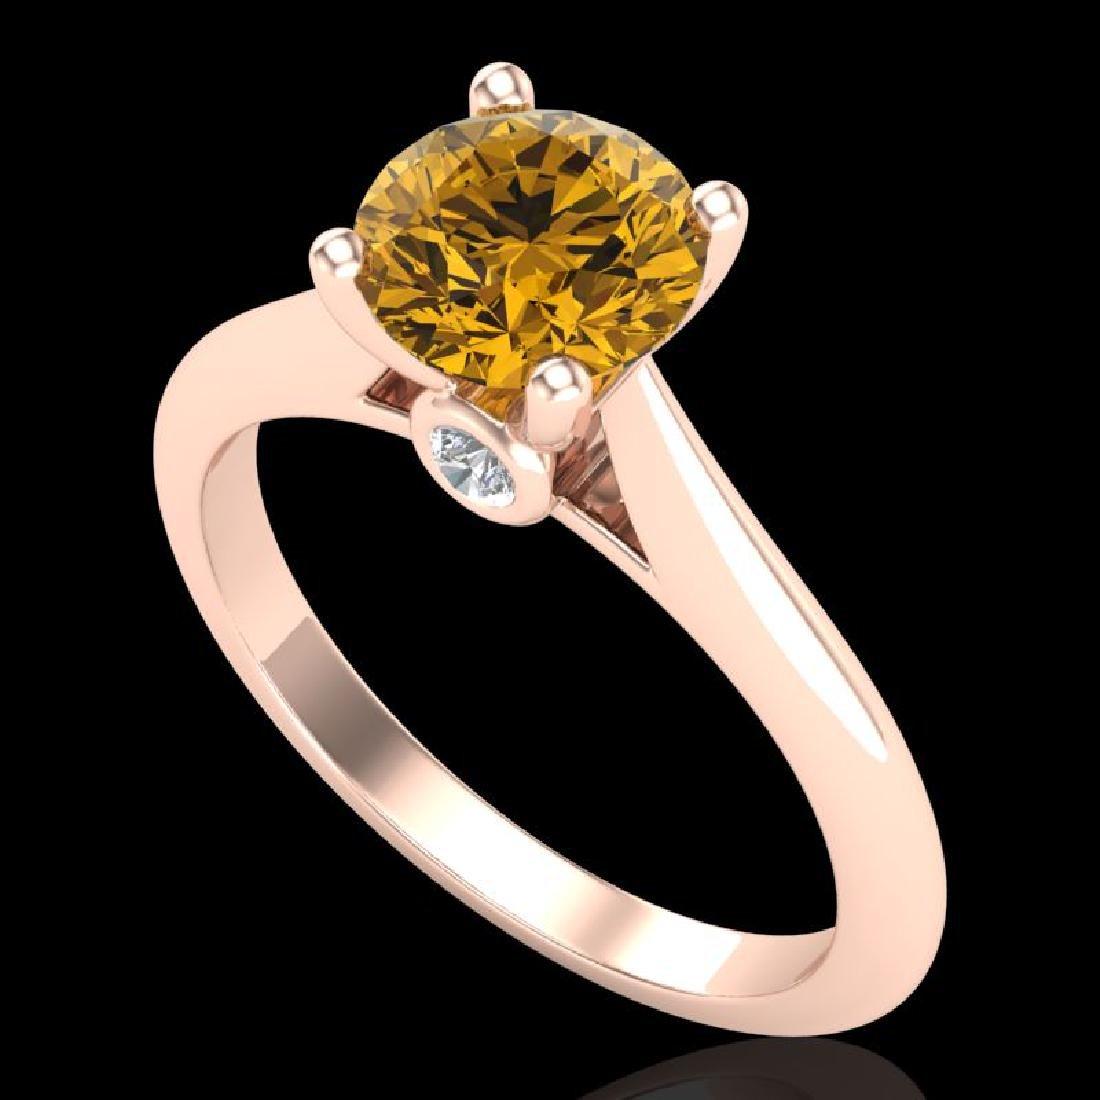 1.36 CTW Intense Fancy Yellow Diamond Engagement Art